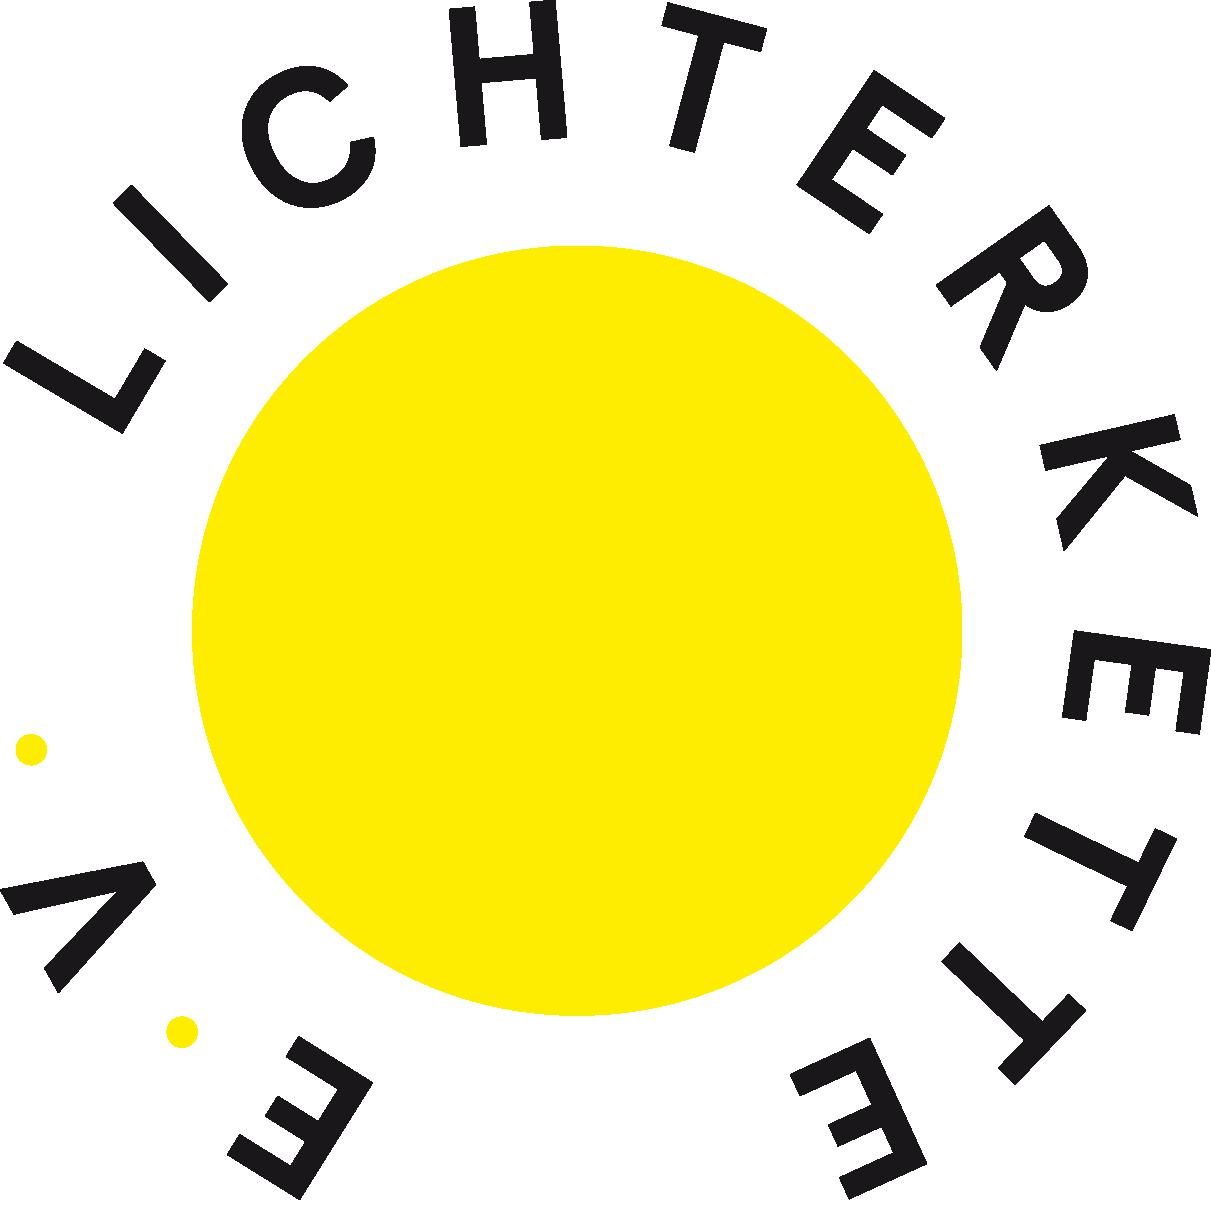 Lichterkette.png